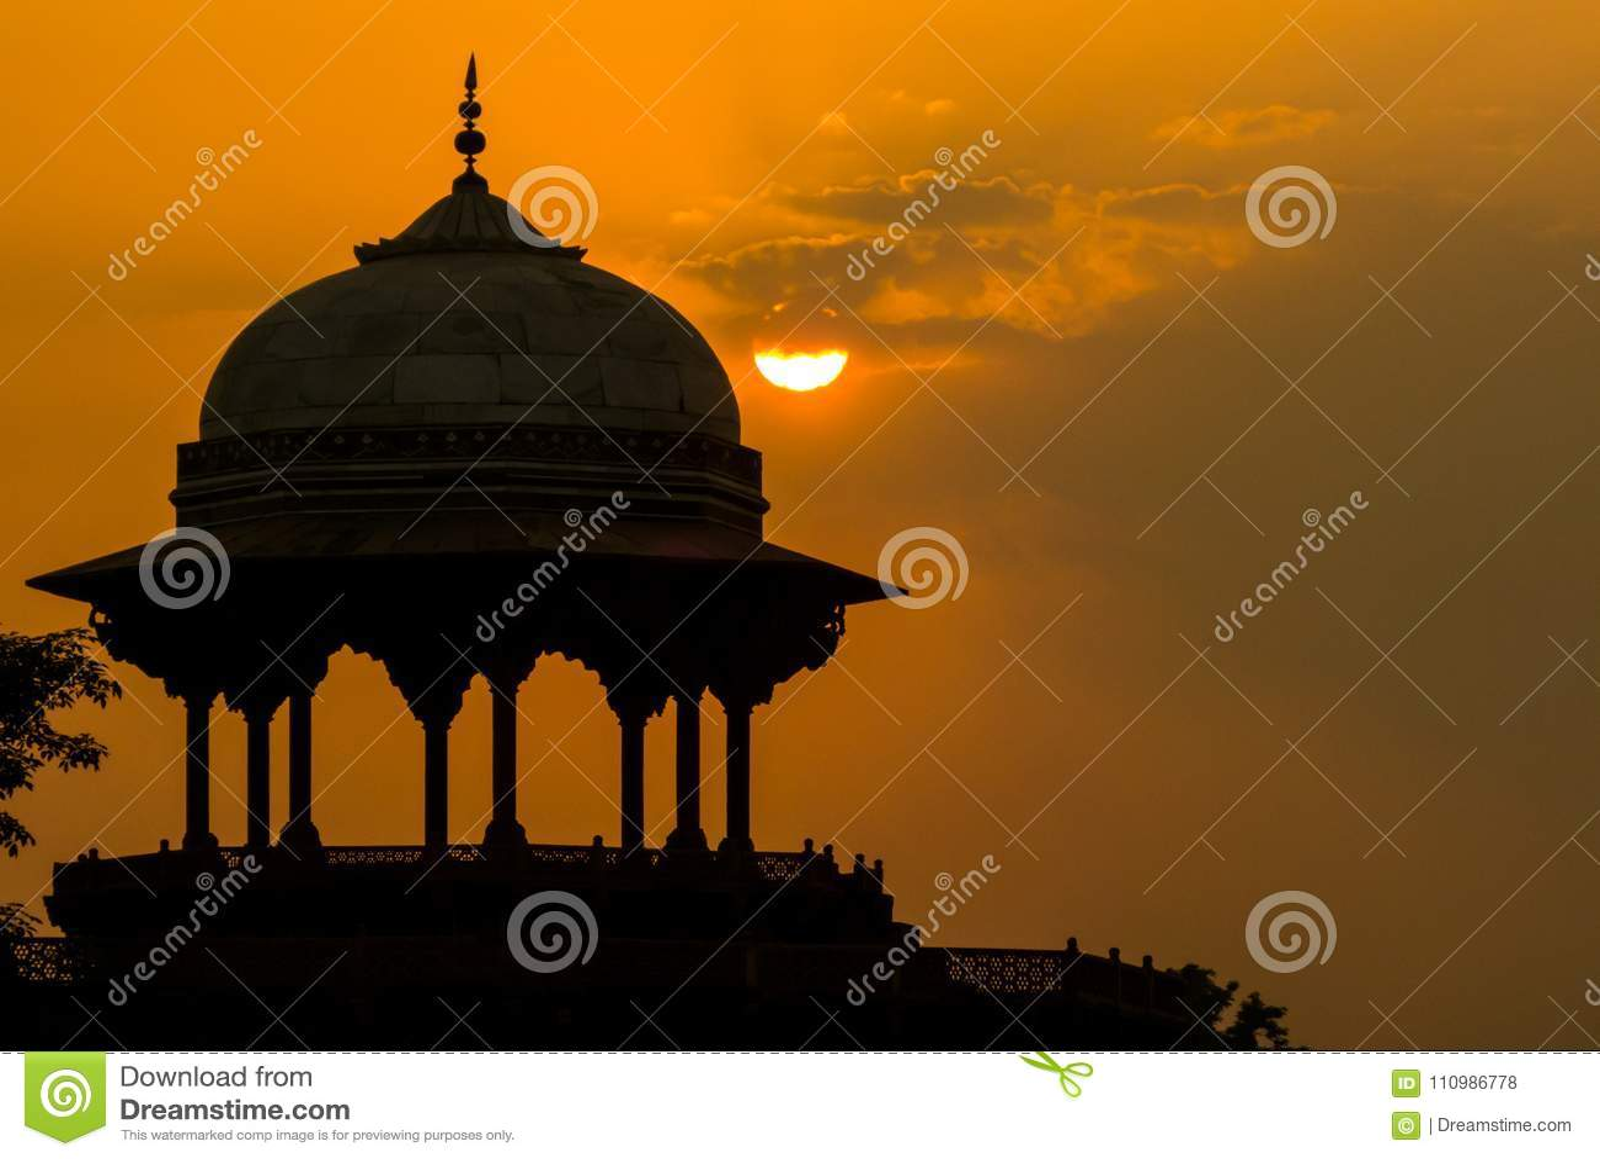 De moskee Kau Ban dichtbij Taj Mahal